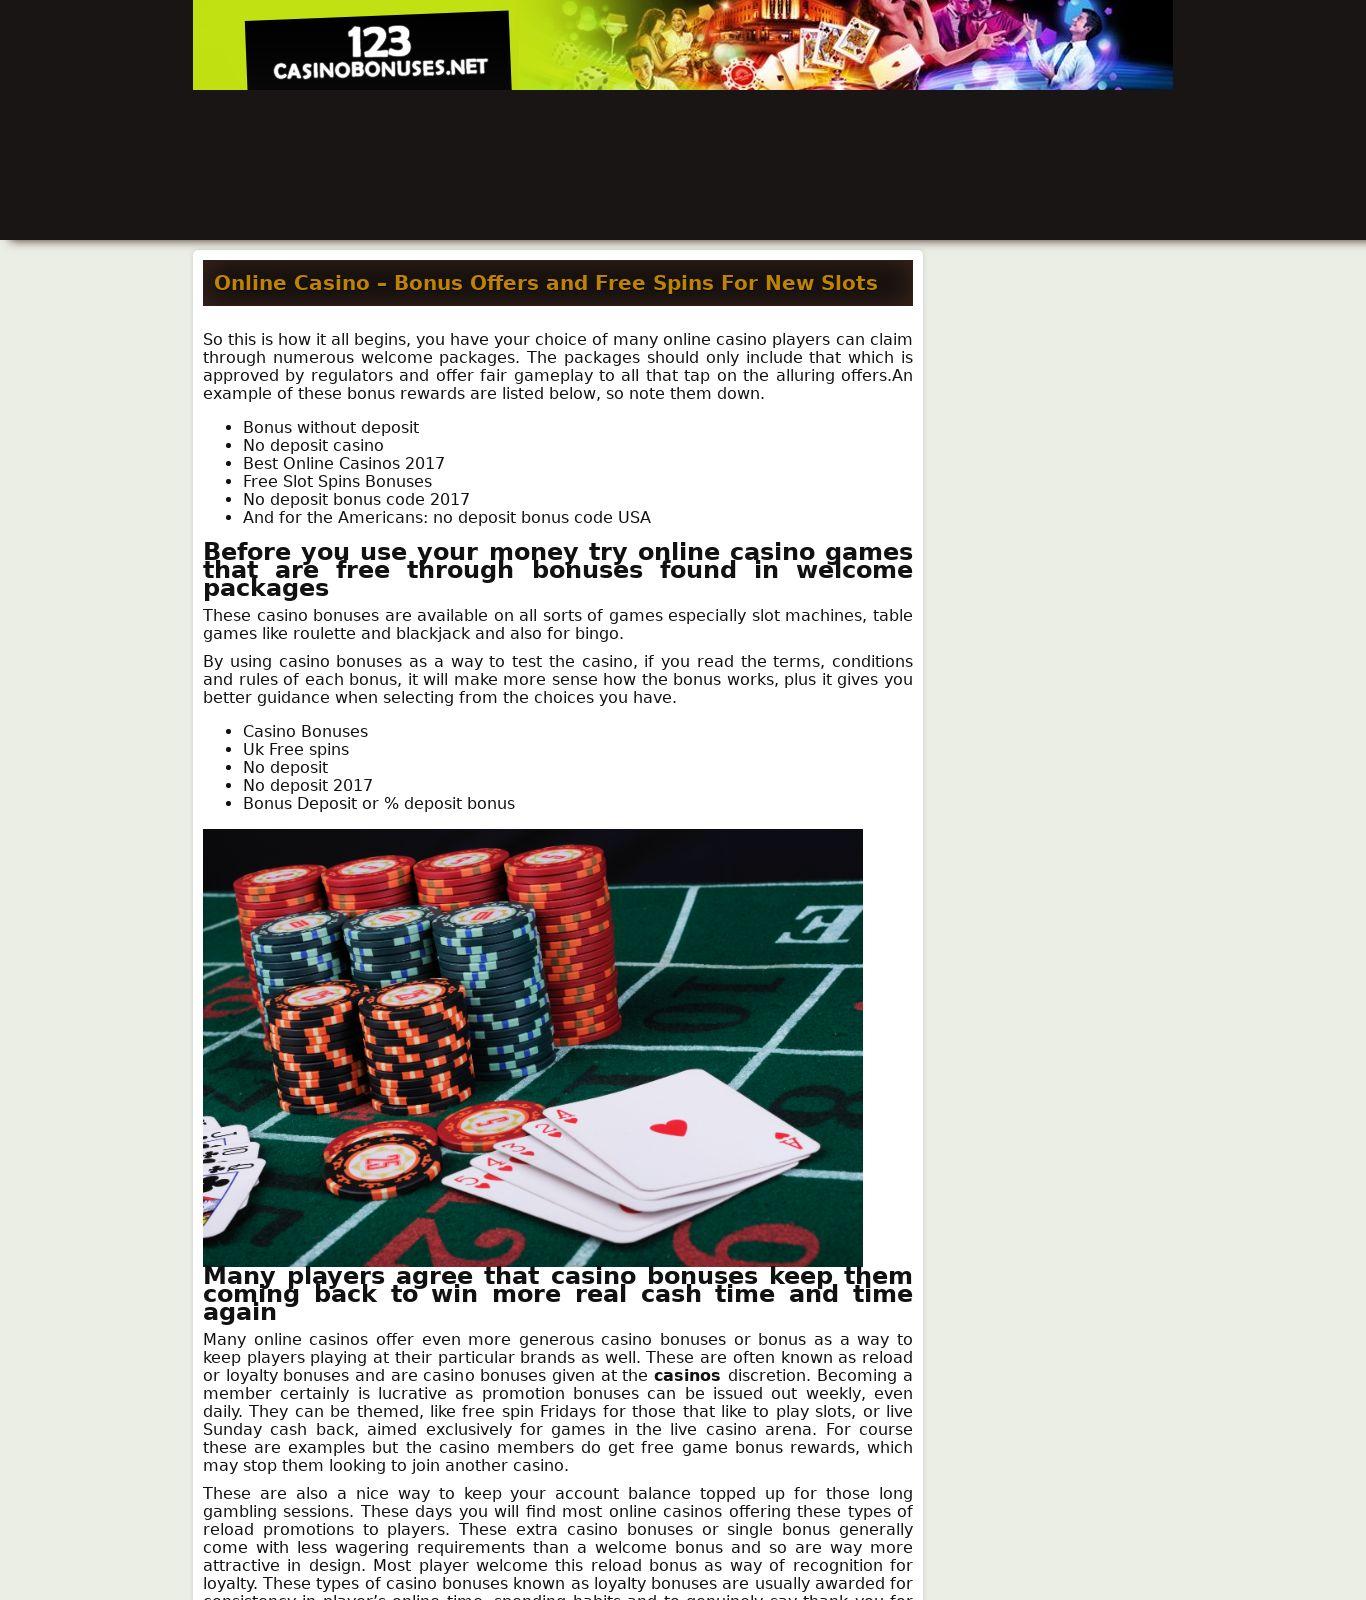 123 Casino Bonuses Review Scam Report 123casinobonuses Net May